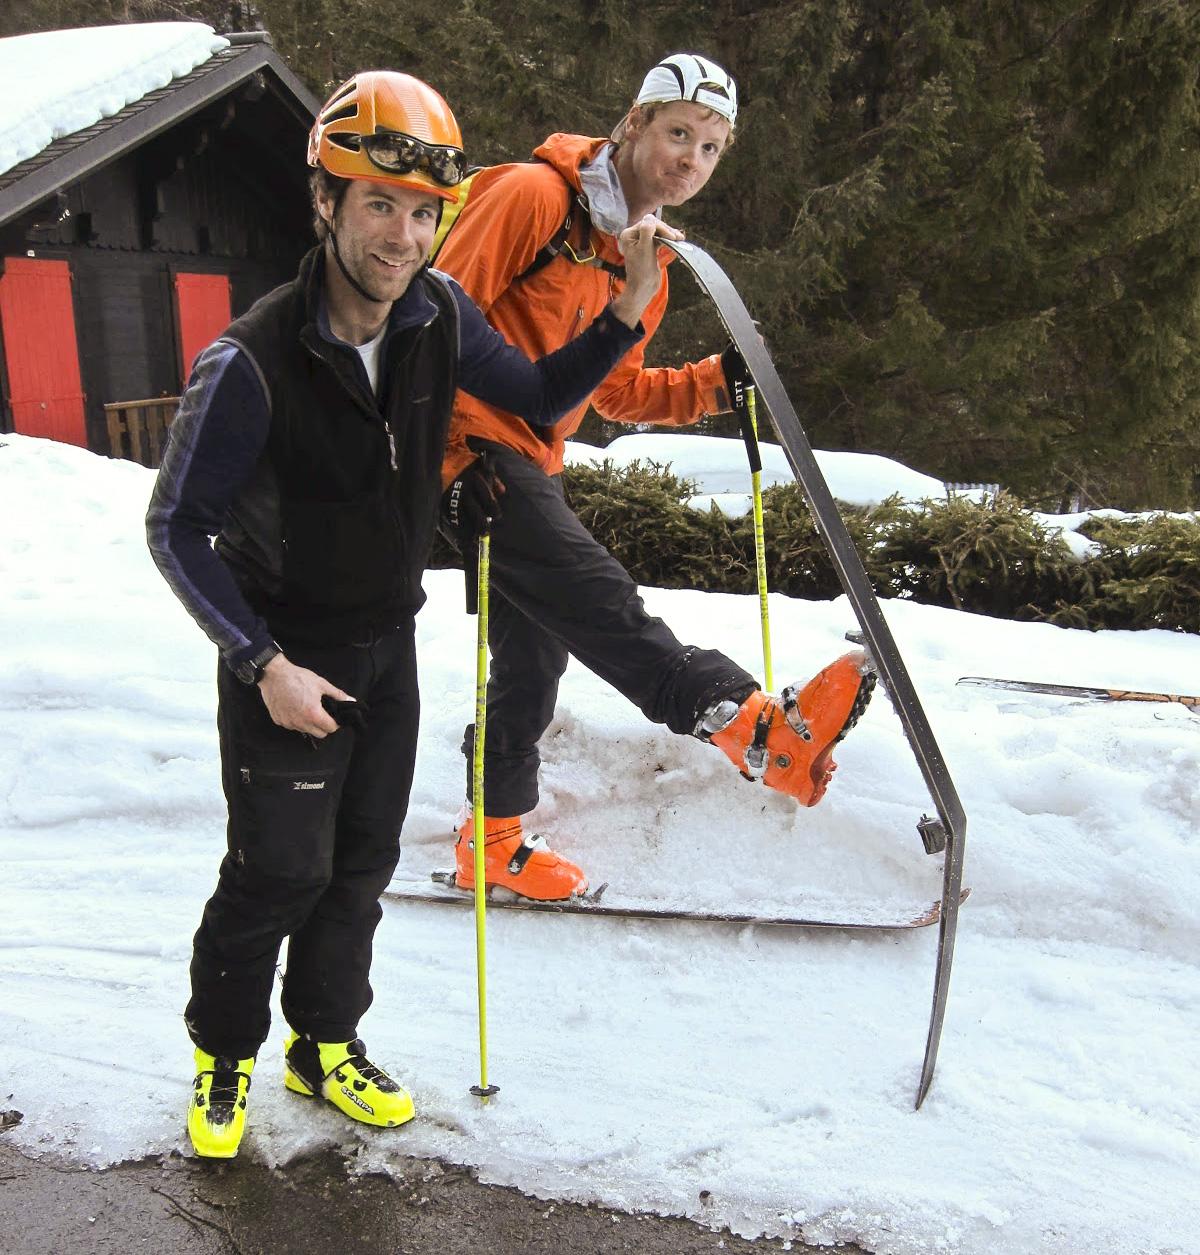 Callum's broken ski